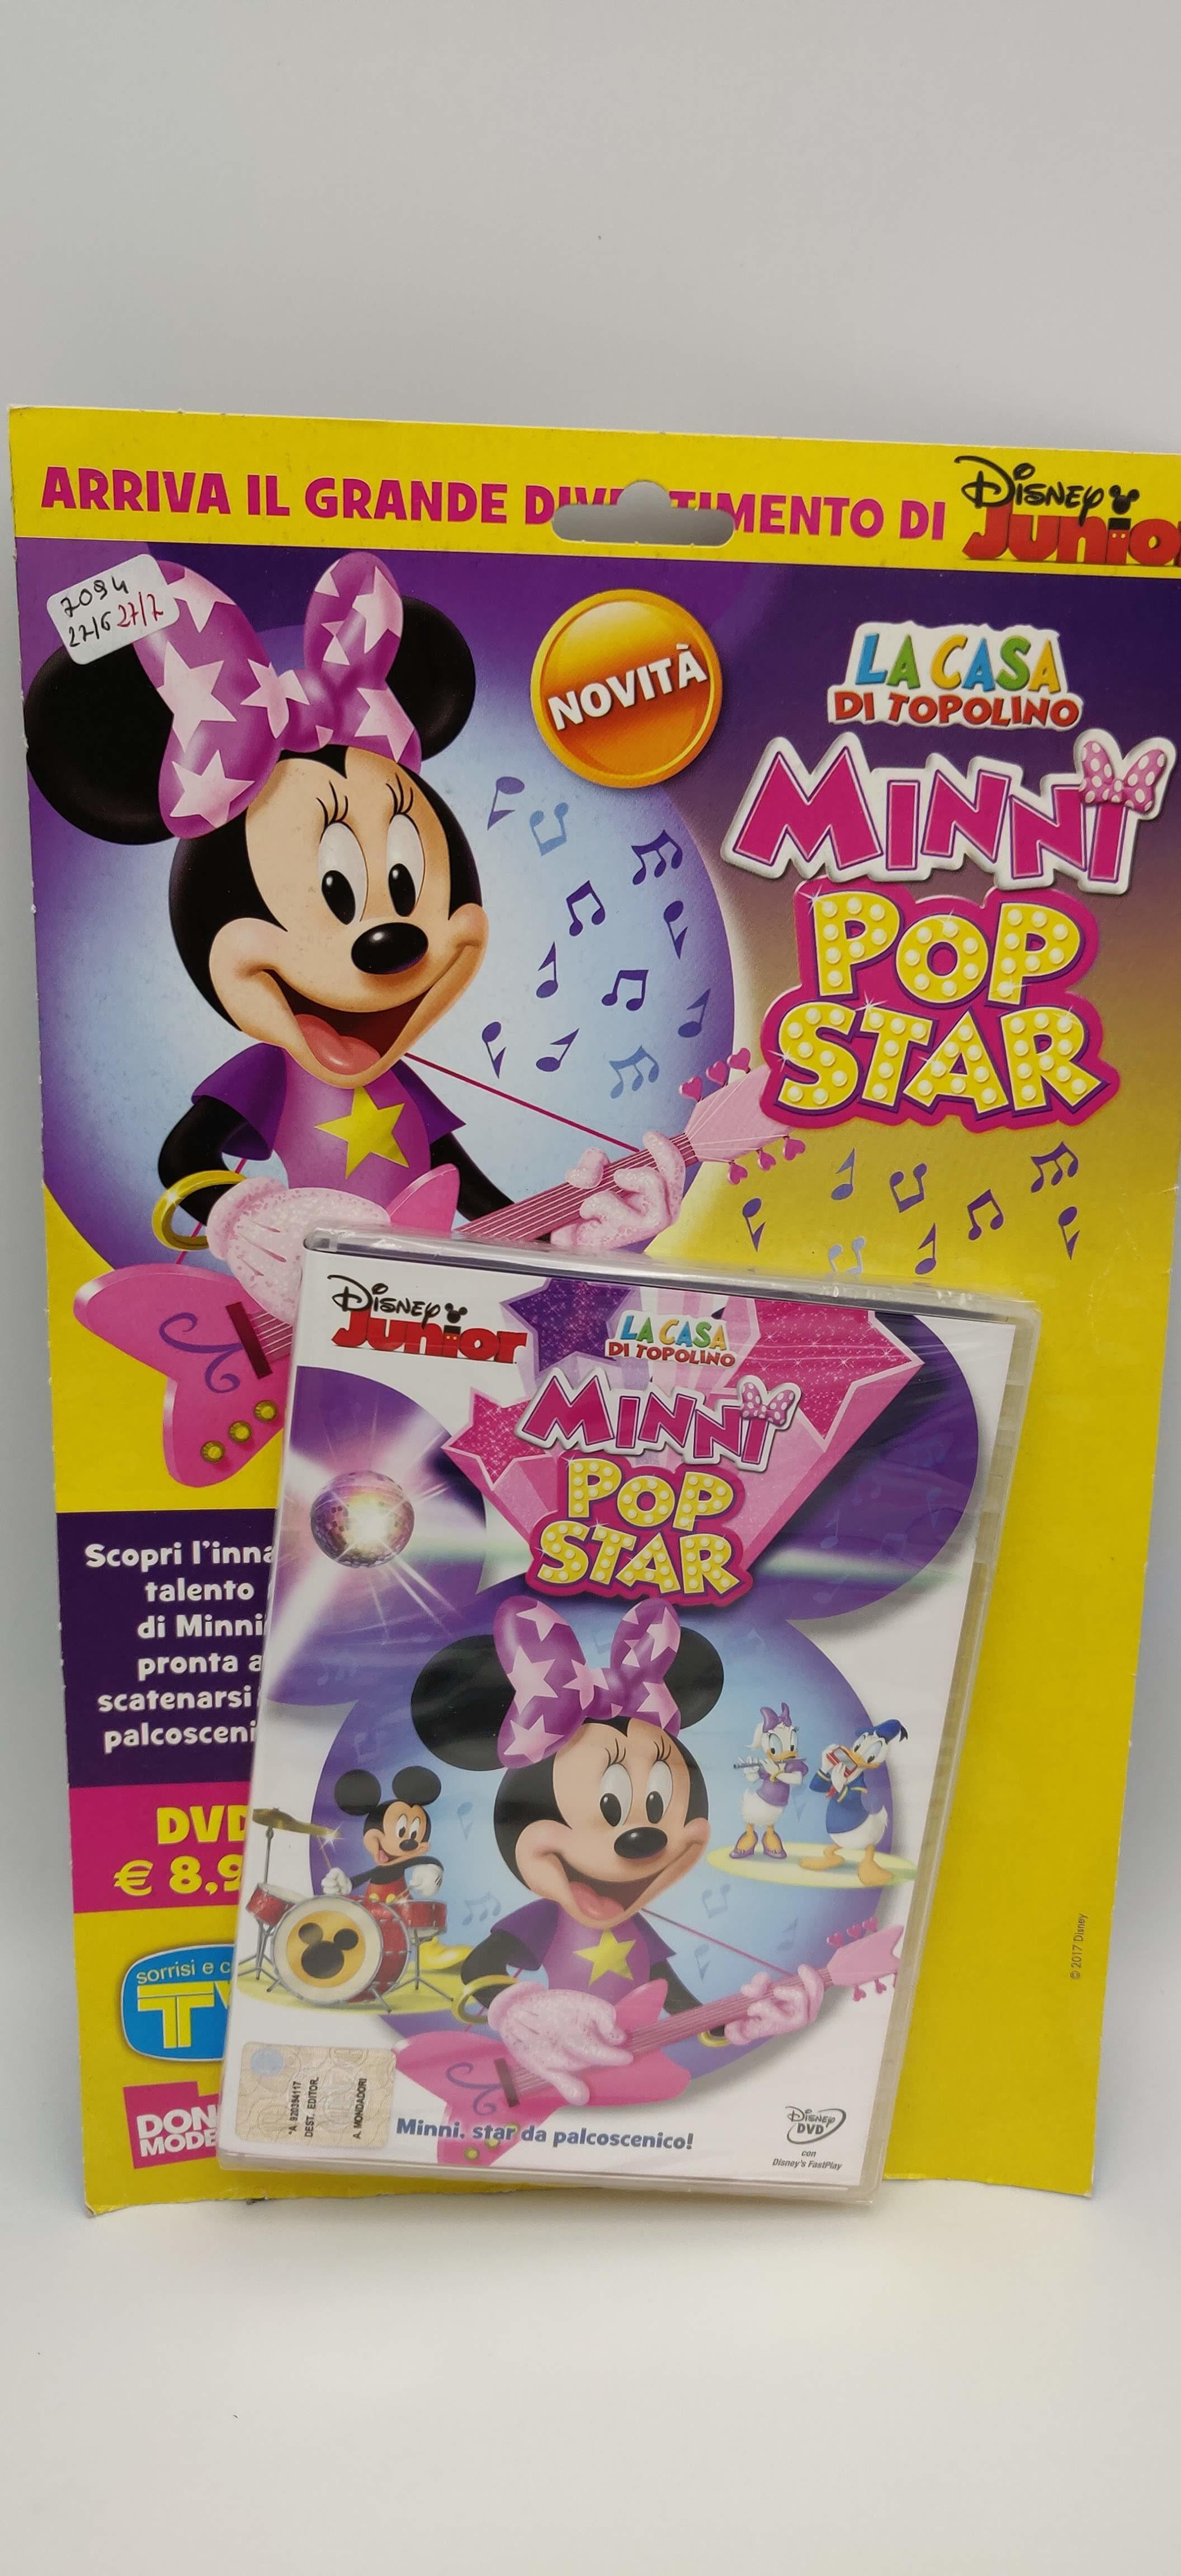 Minnie Minni Popstar The Mansion Di Topolino Carton Dvd Disney